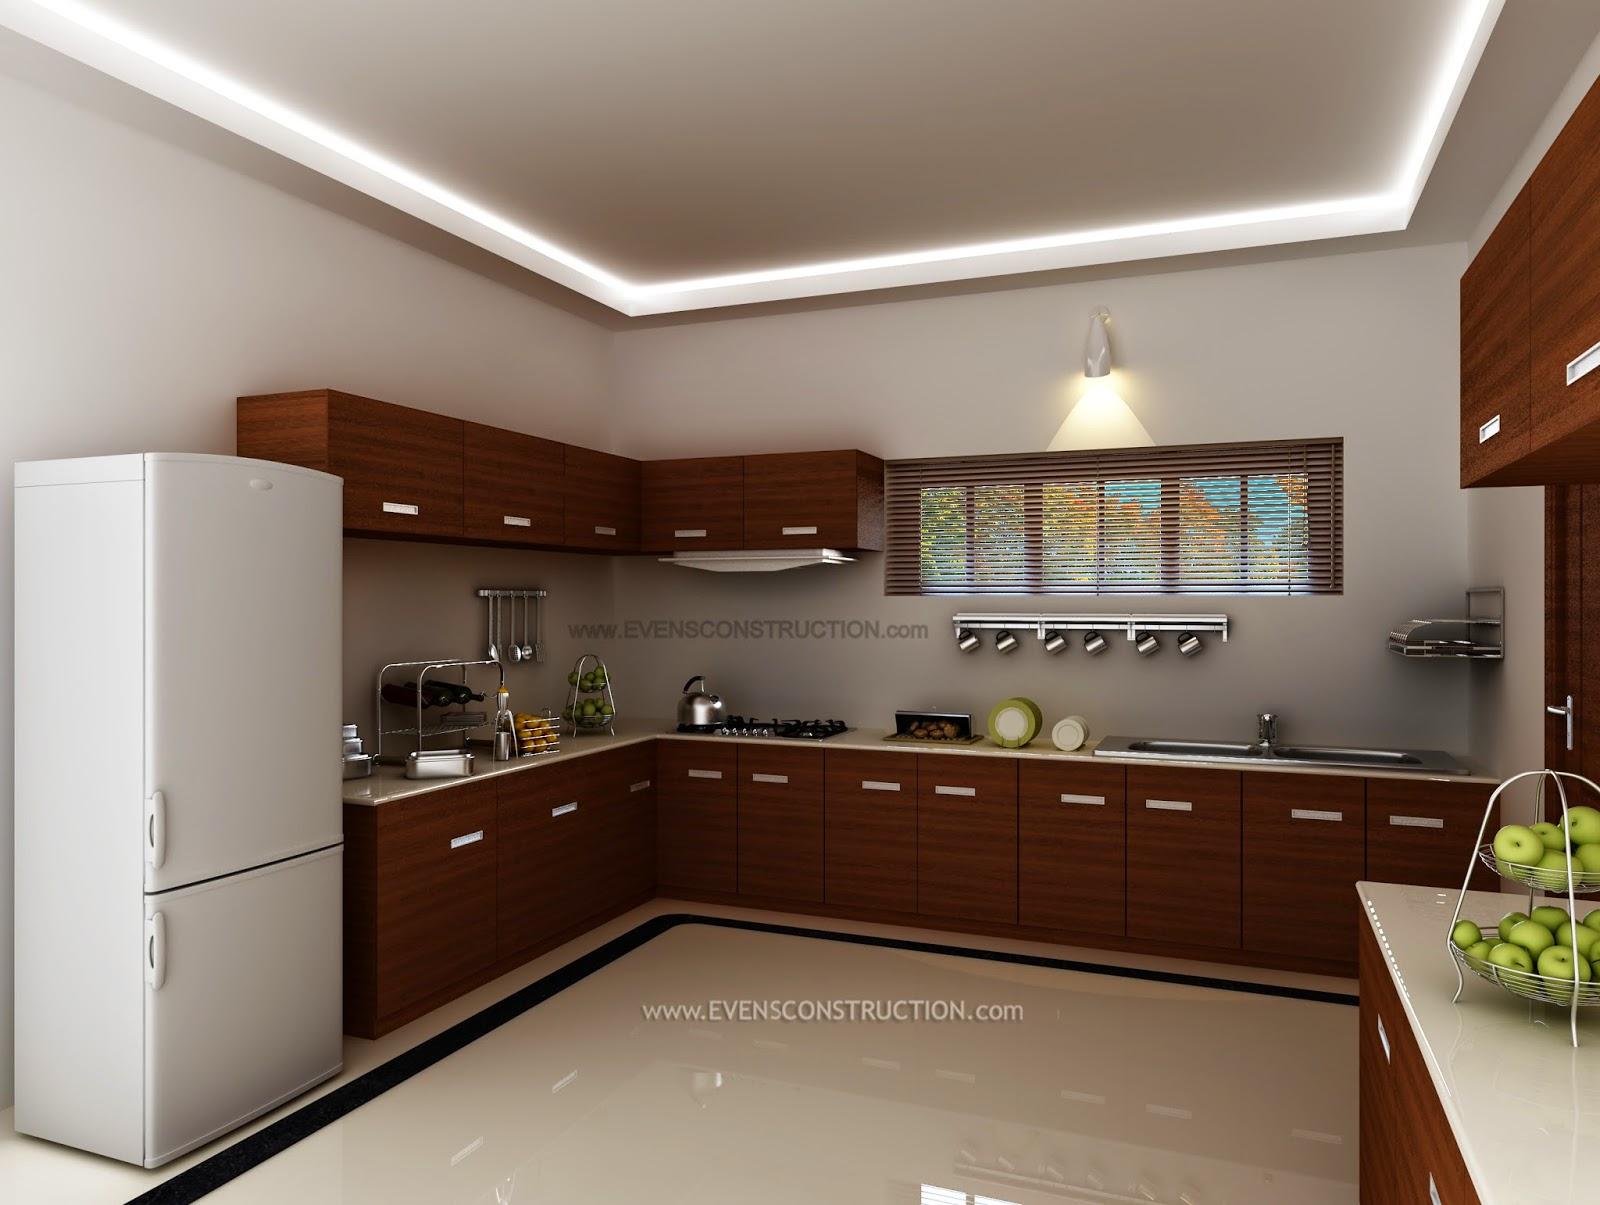 evens construction pvt ltd kerala kitchen interior. Black Bedroom Furniture Sets. Home Design Ideas